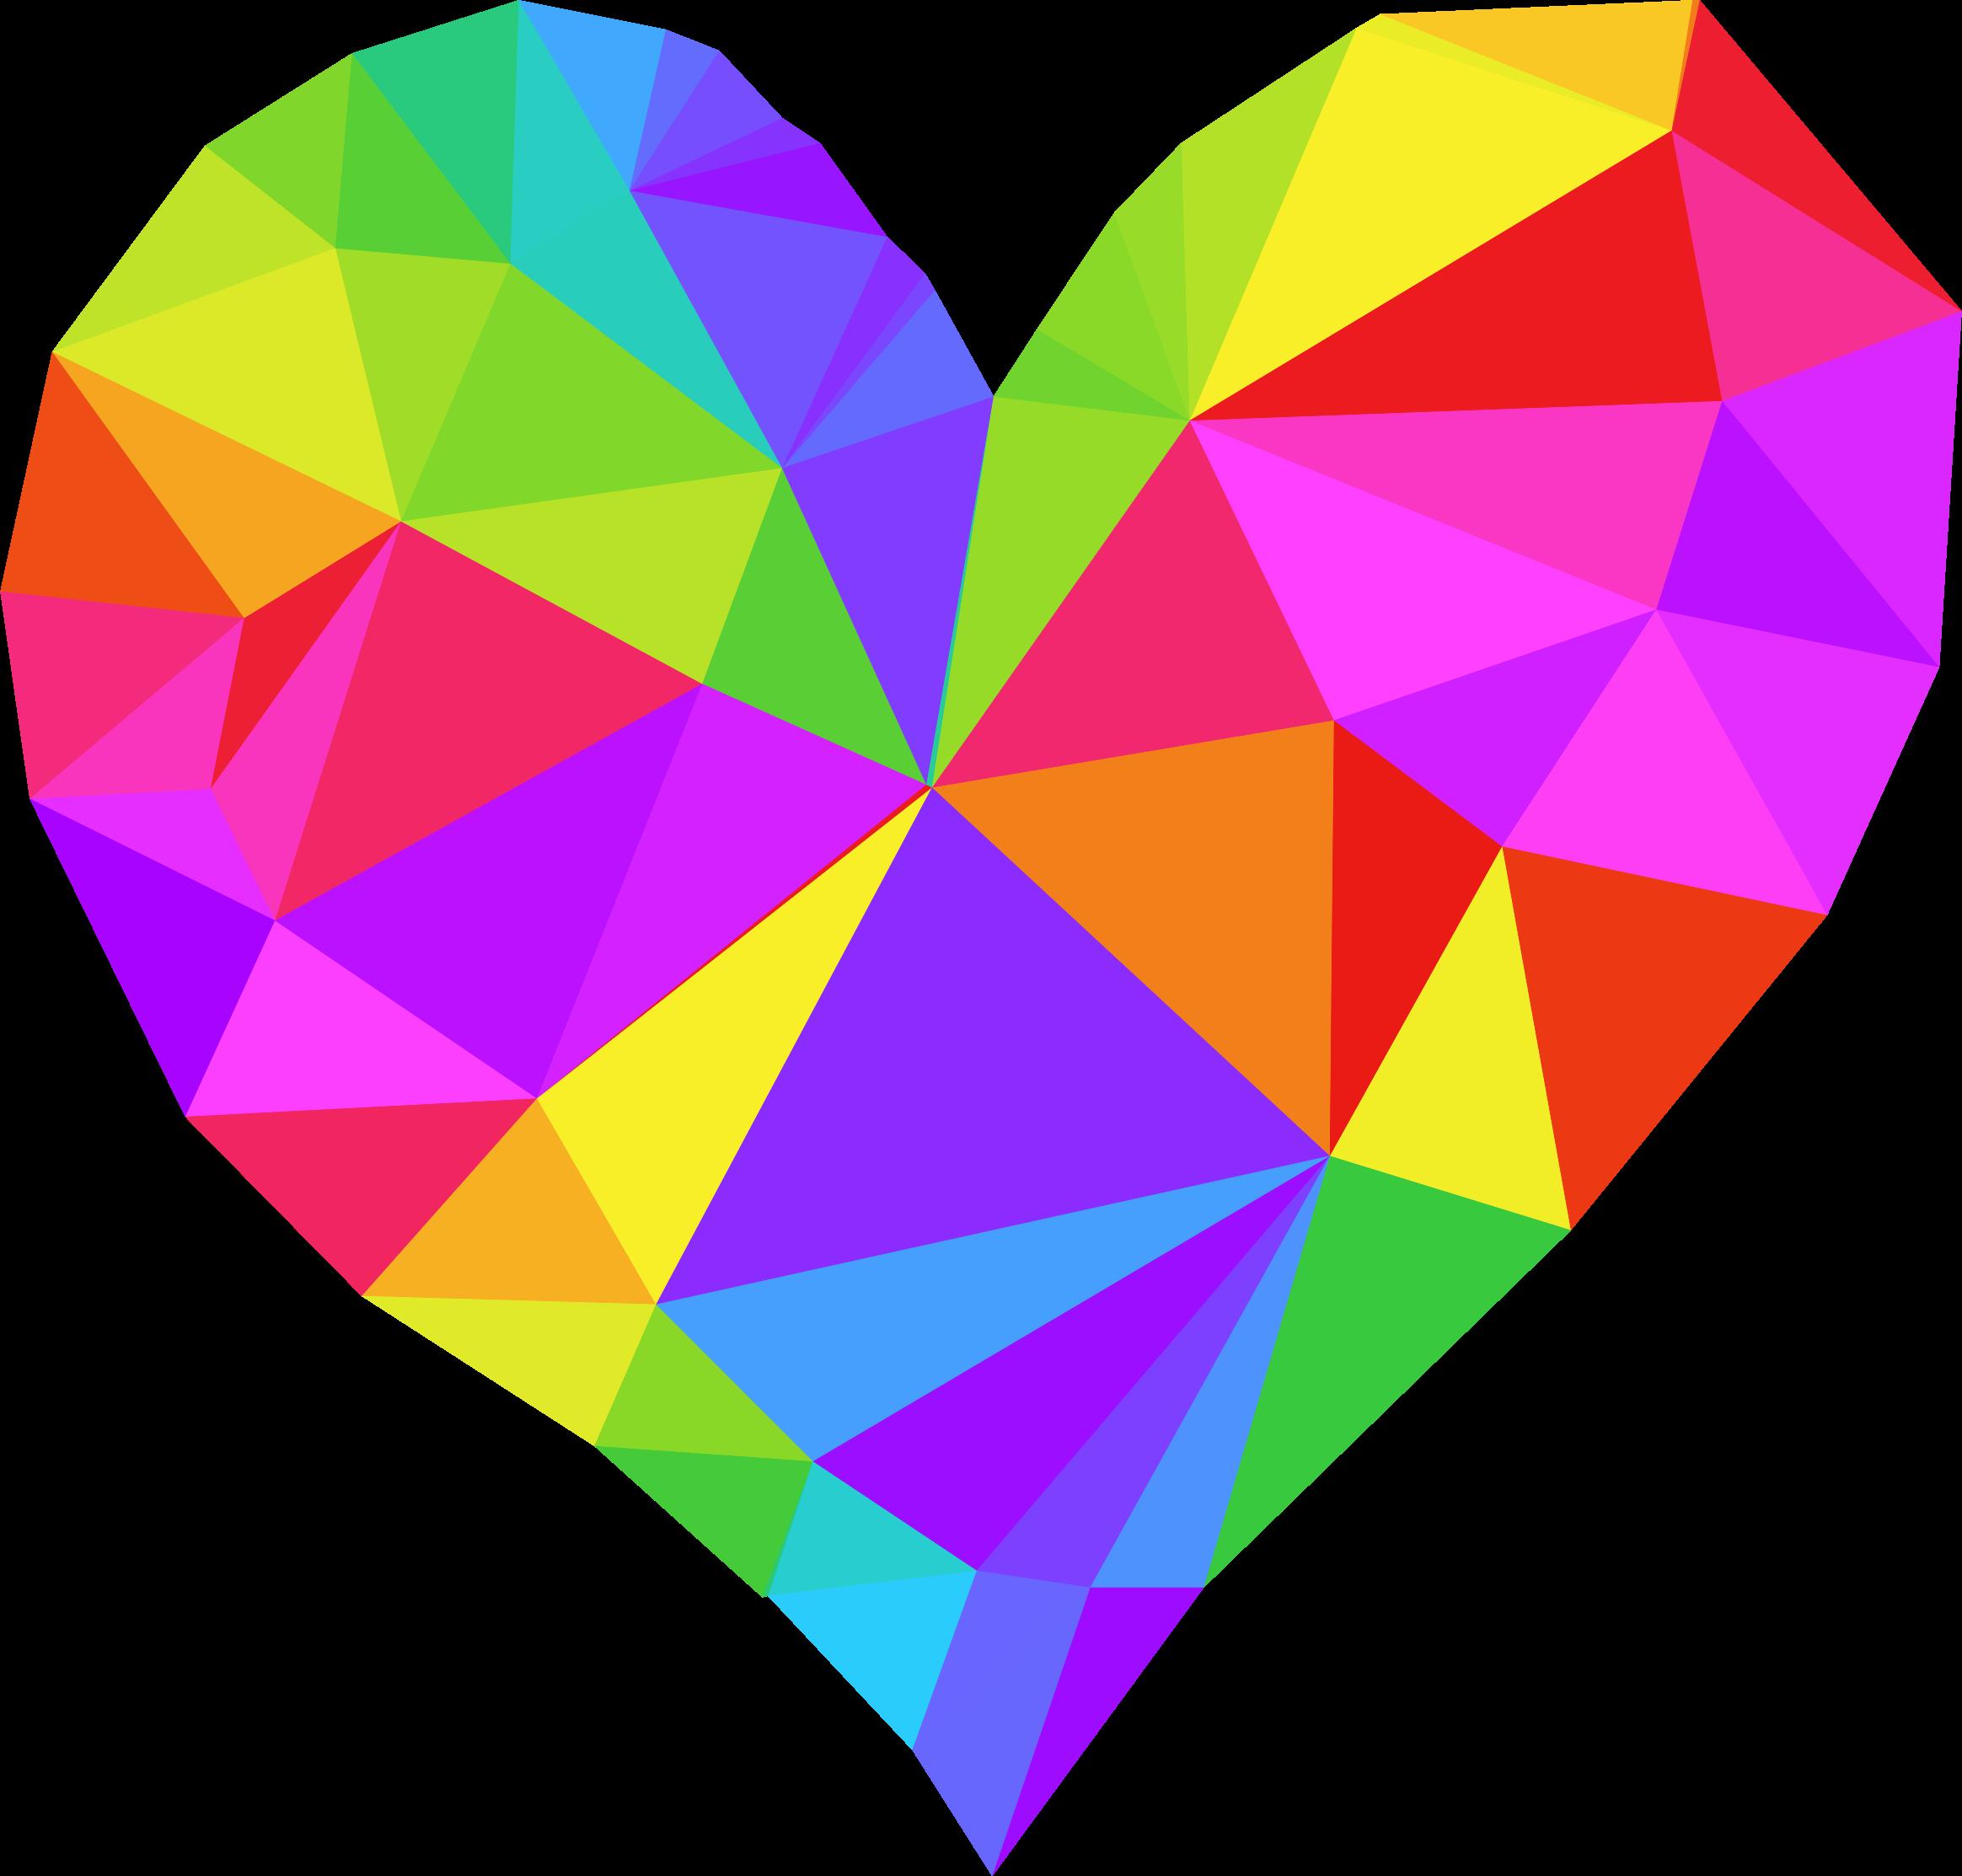 Low Poly Heart Art Logo Rainbow Colors Heart Art